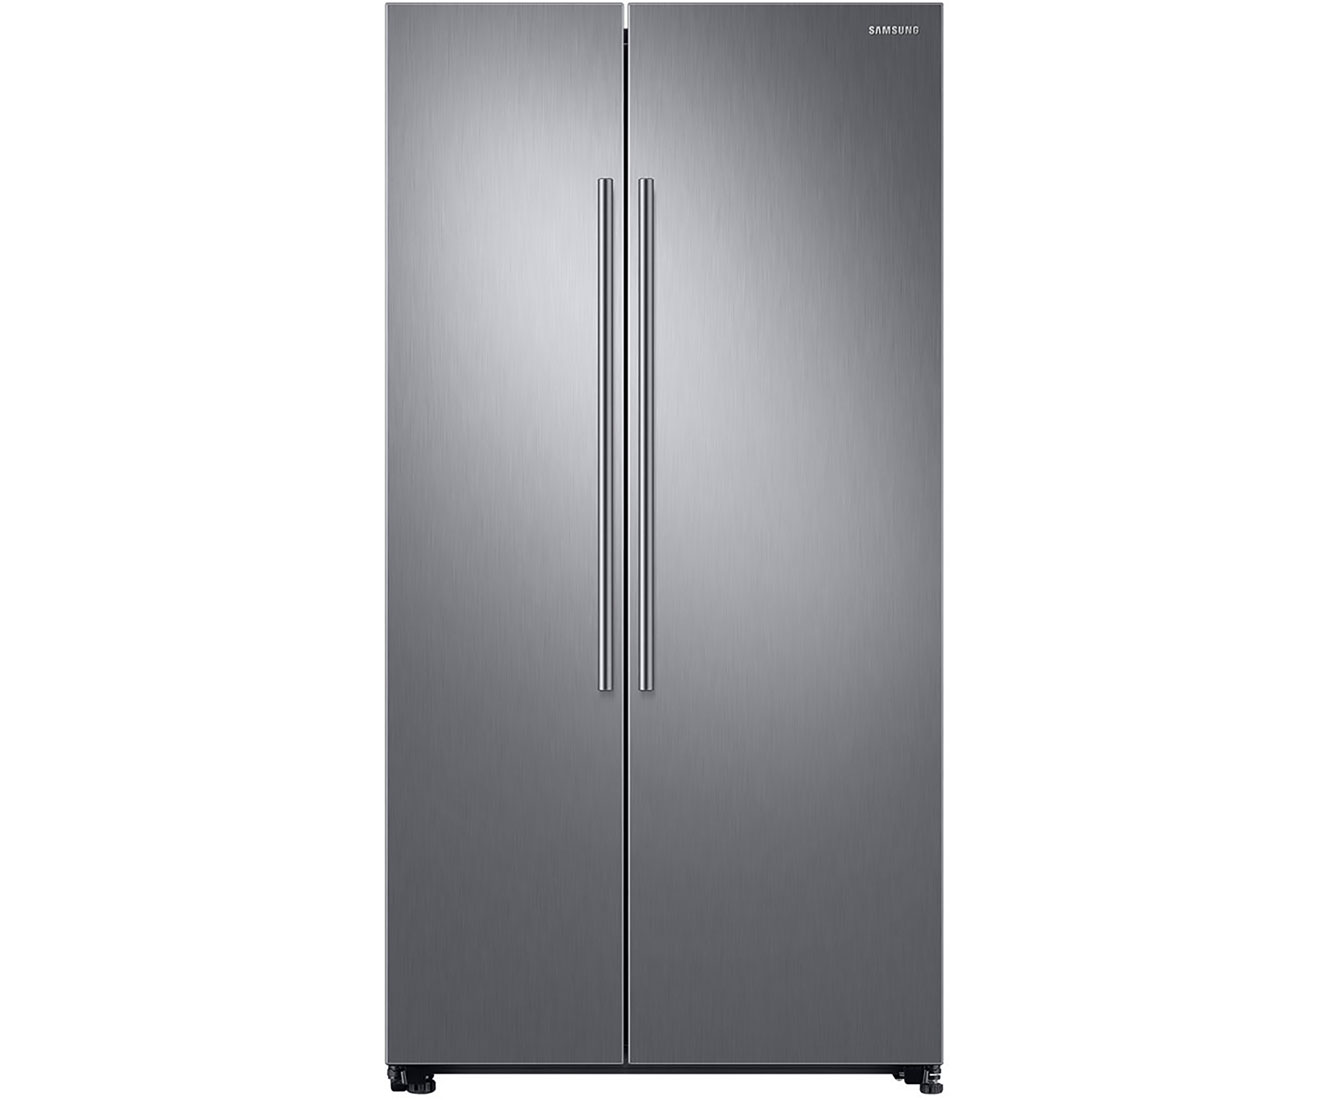 Side By Side Kühlschrank 120 Cm Breit : Rabatt preisvergleich haushalt u e kühlschränke u e side by side